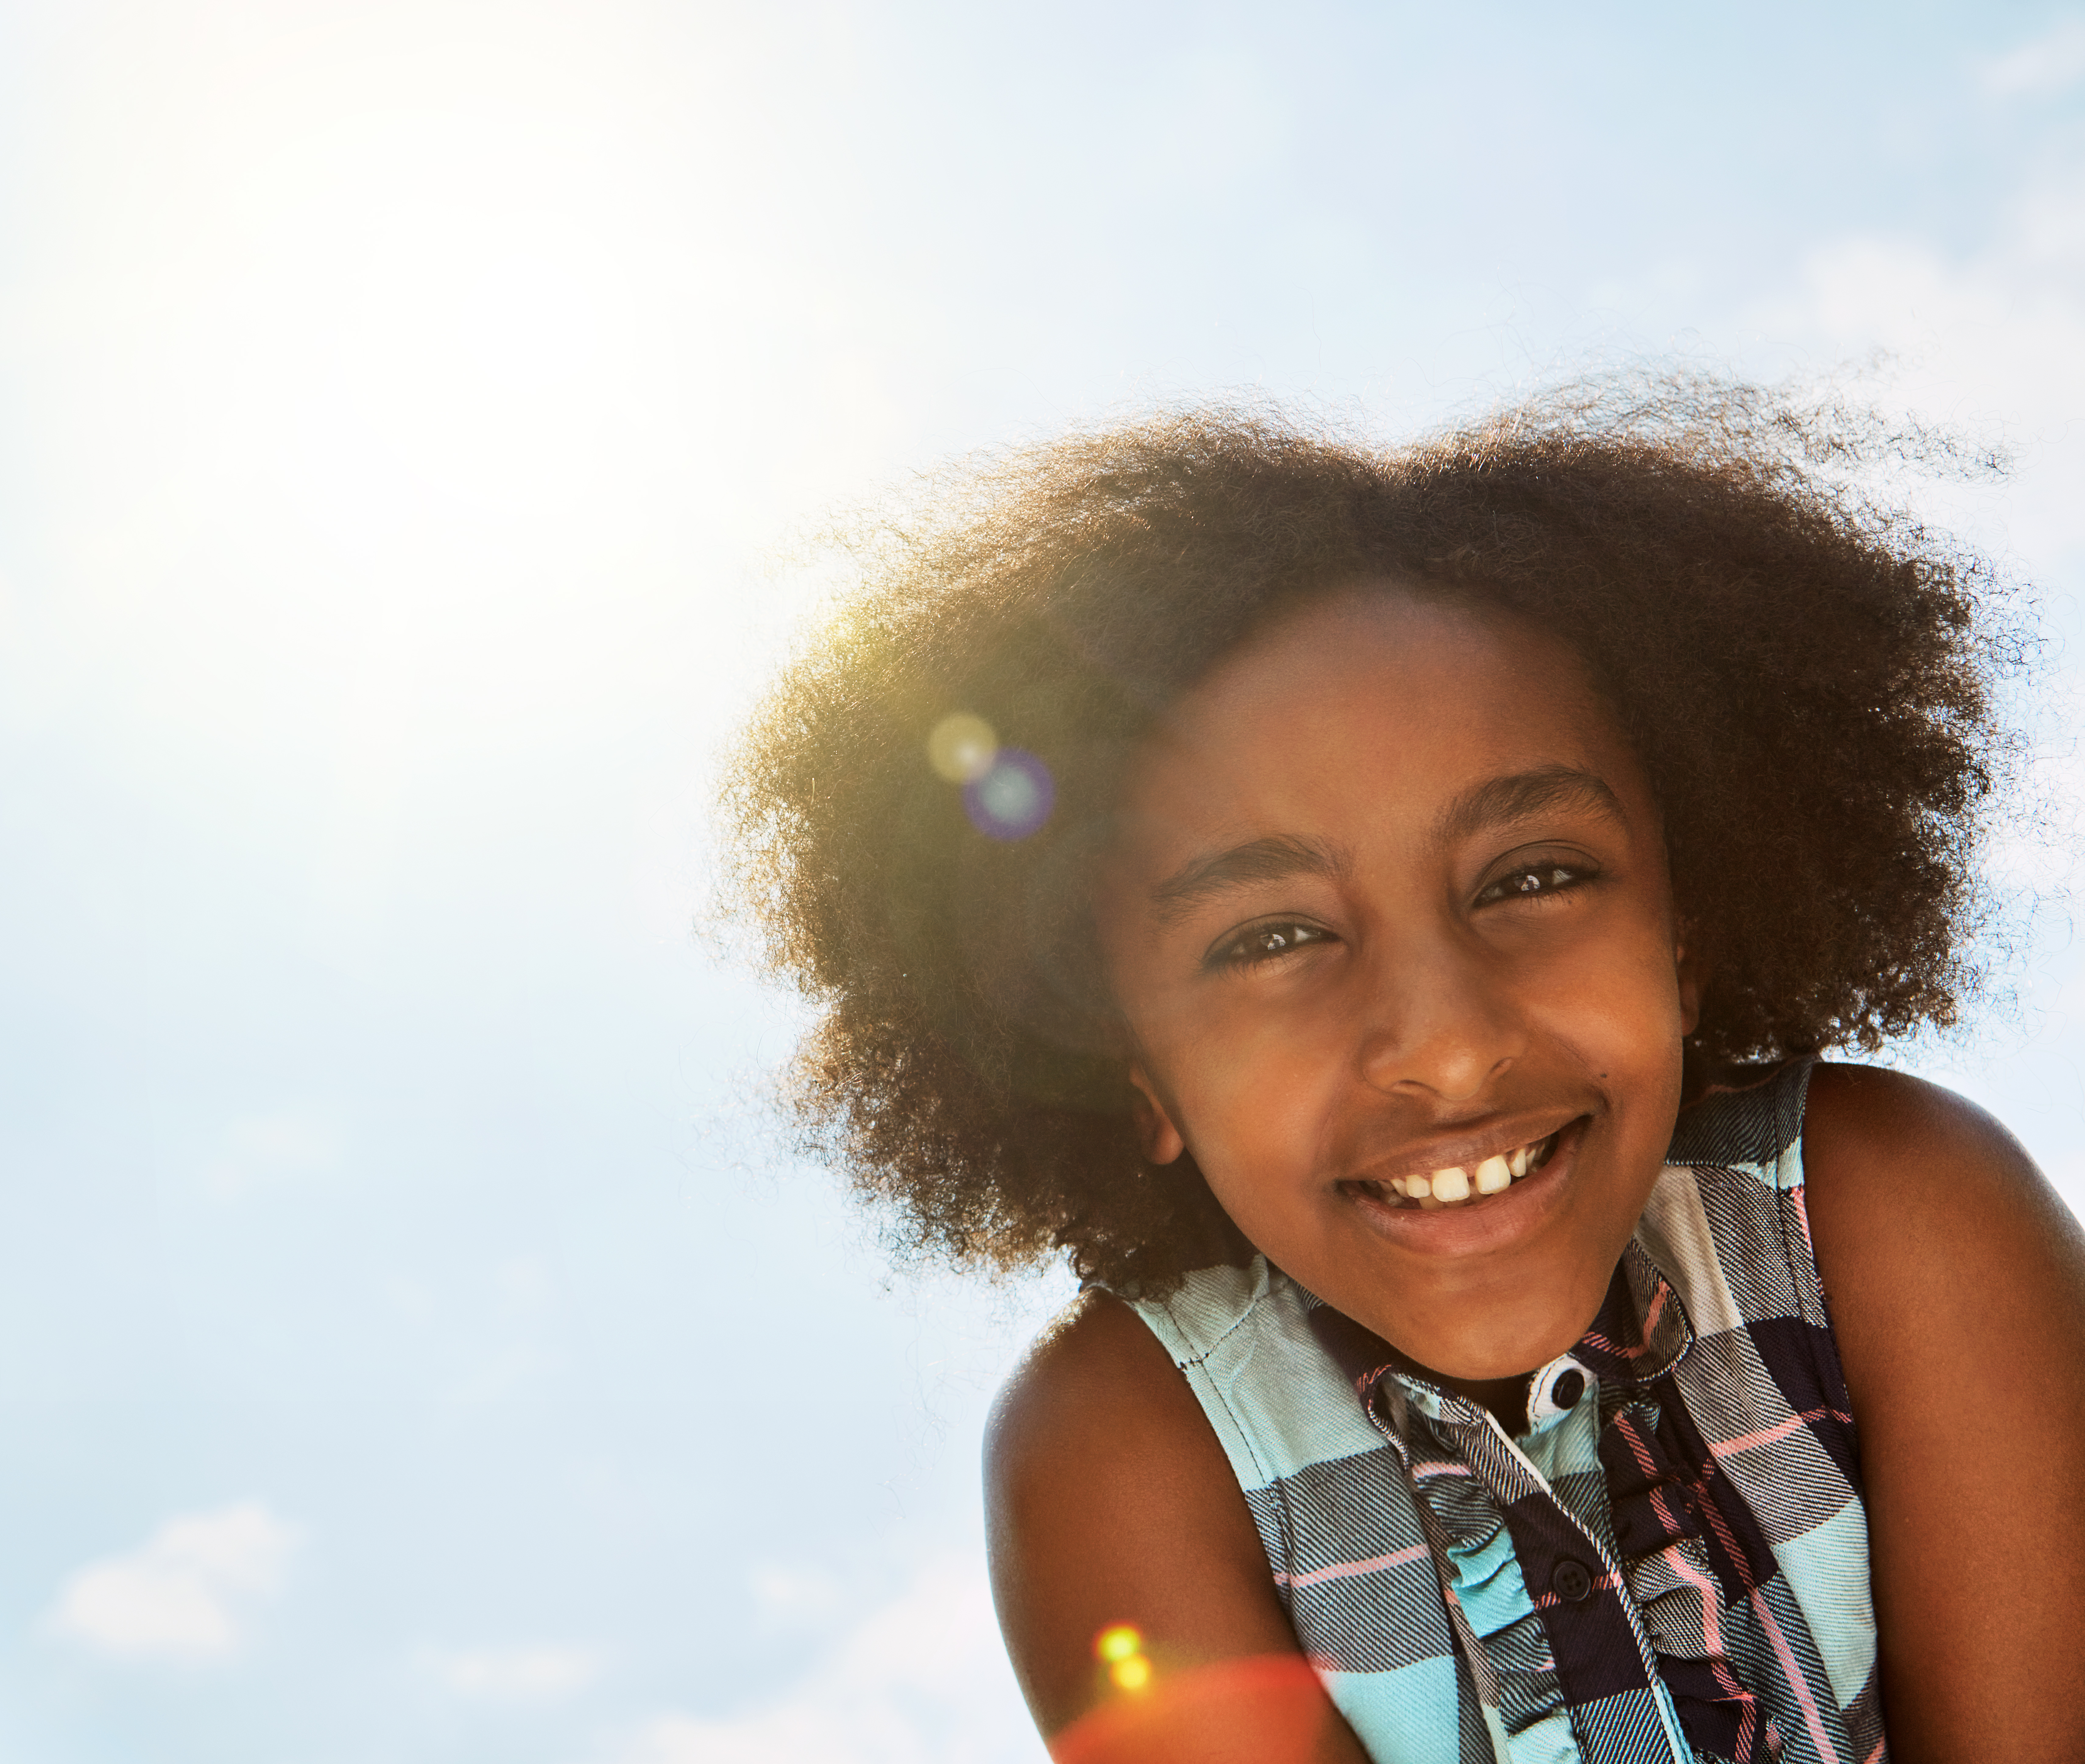 Sunny days make for sunny smiles